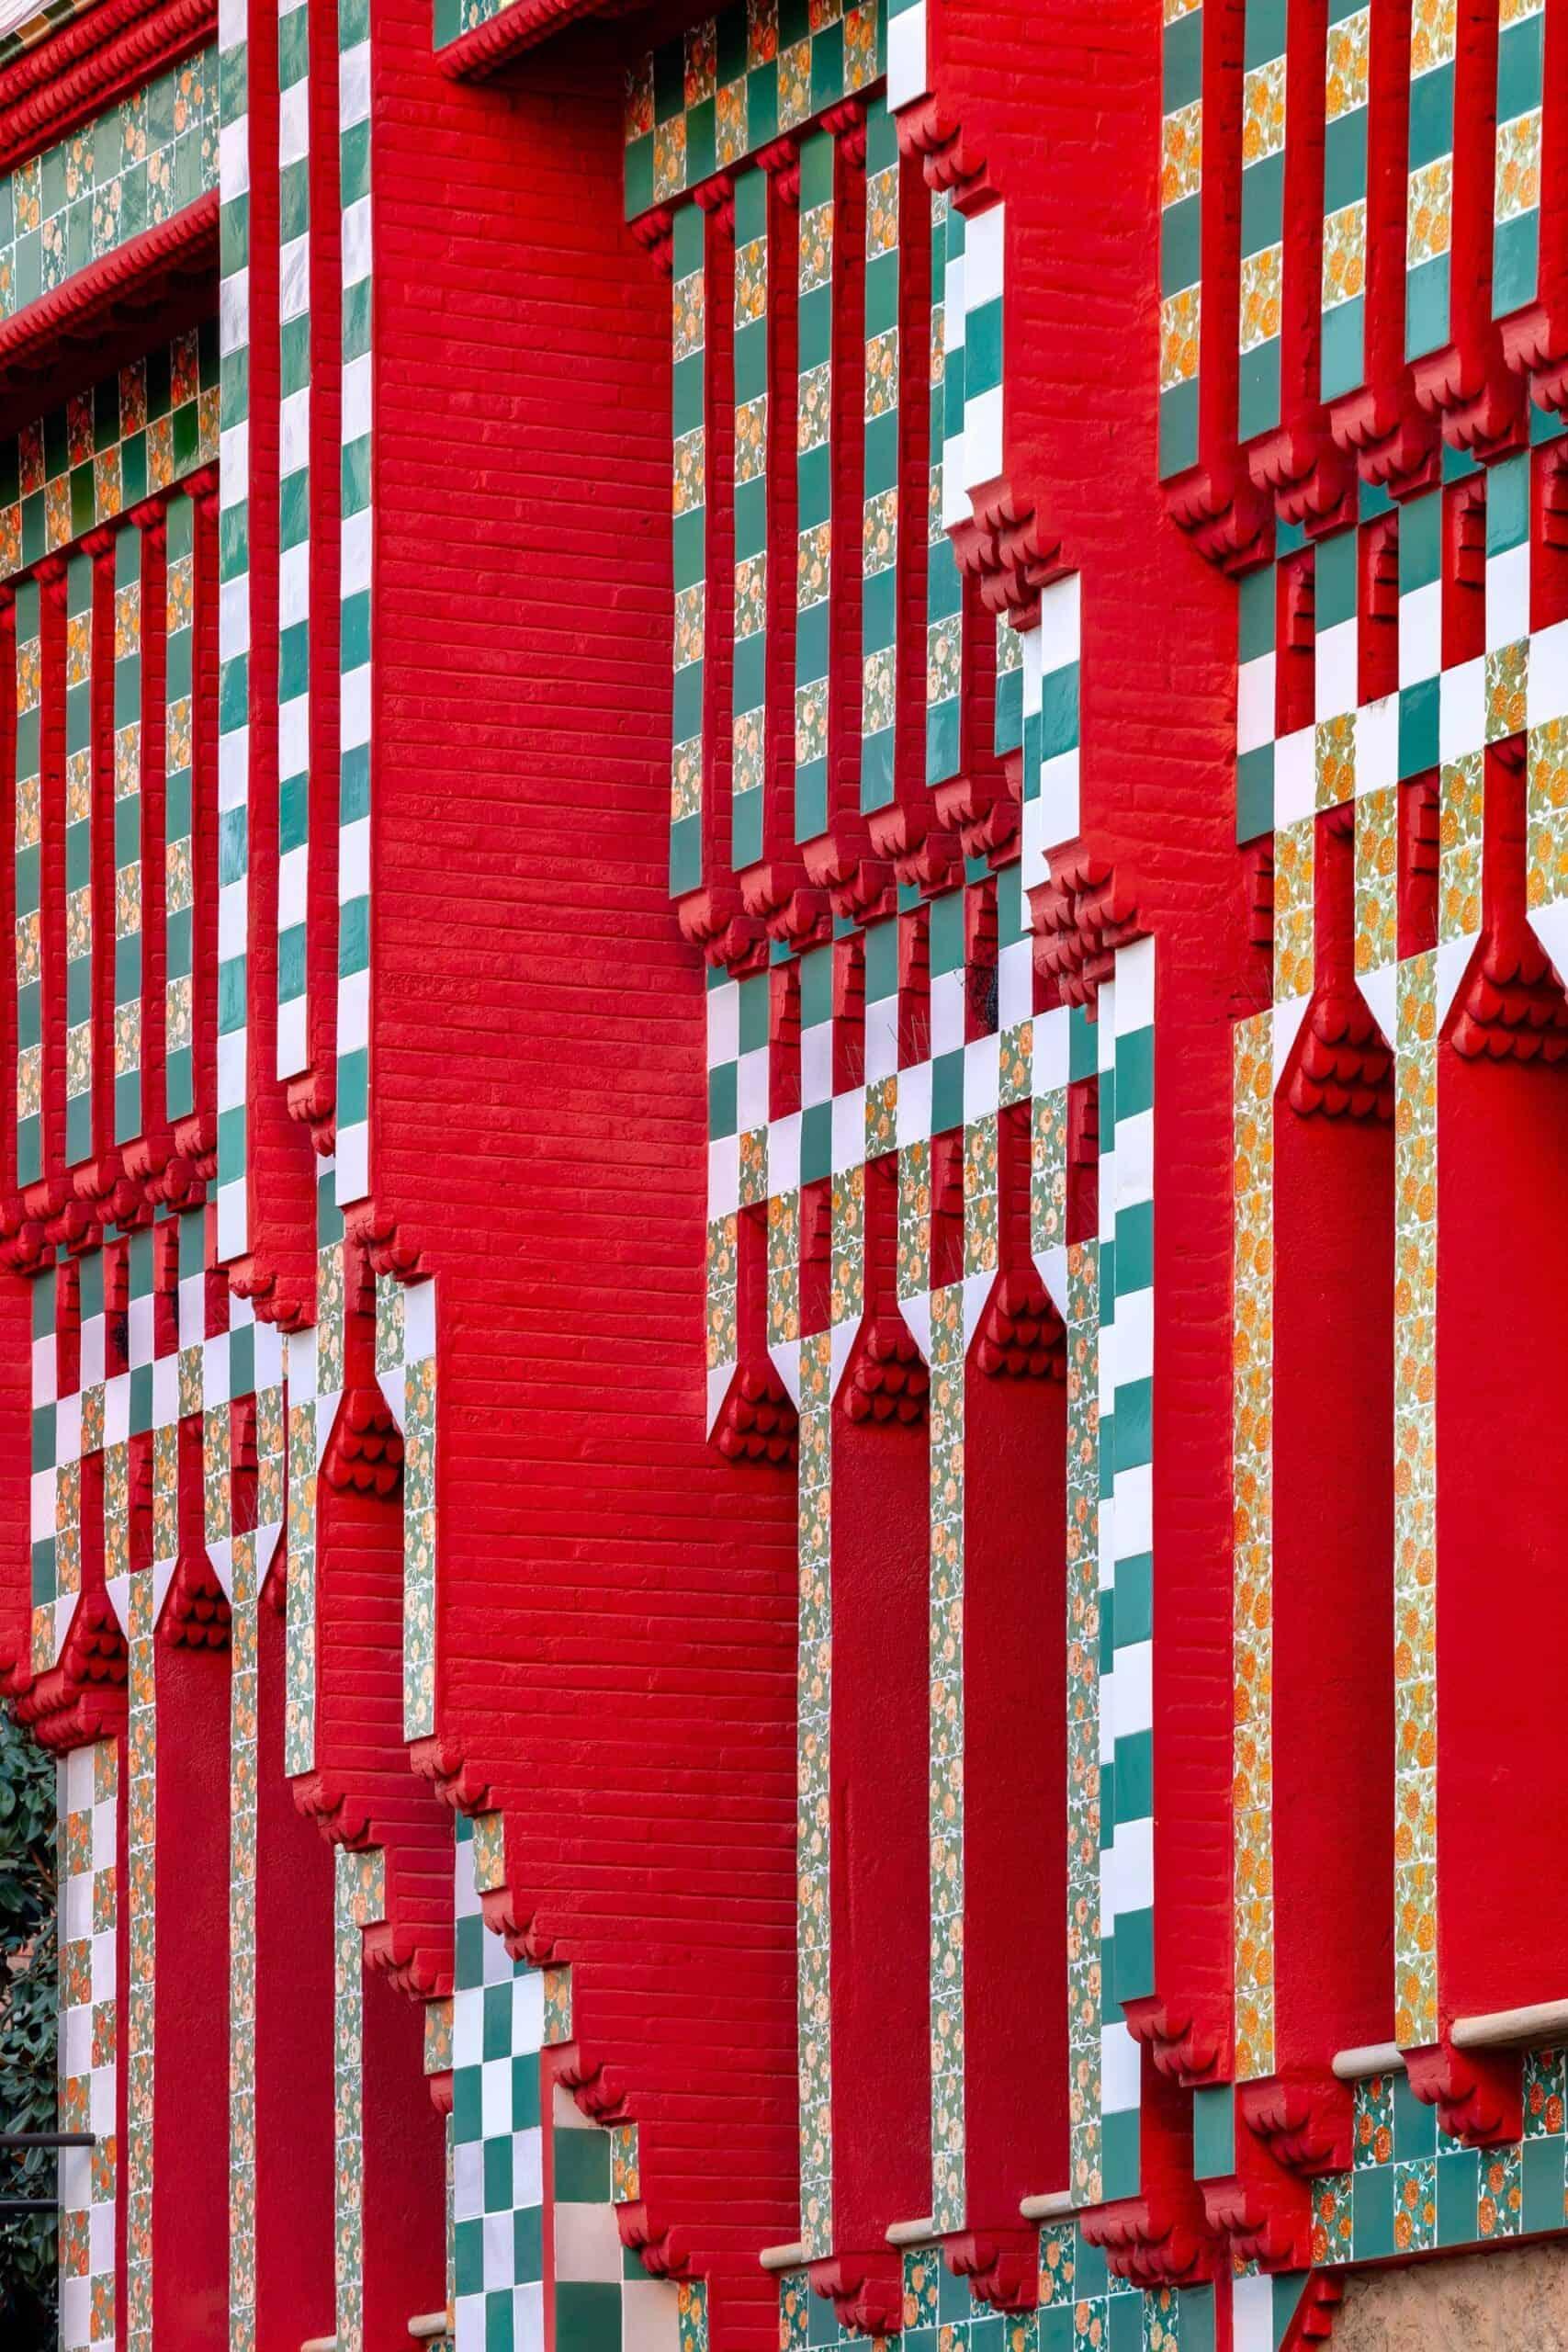 Casa Vicens van Antoni Gaudí